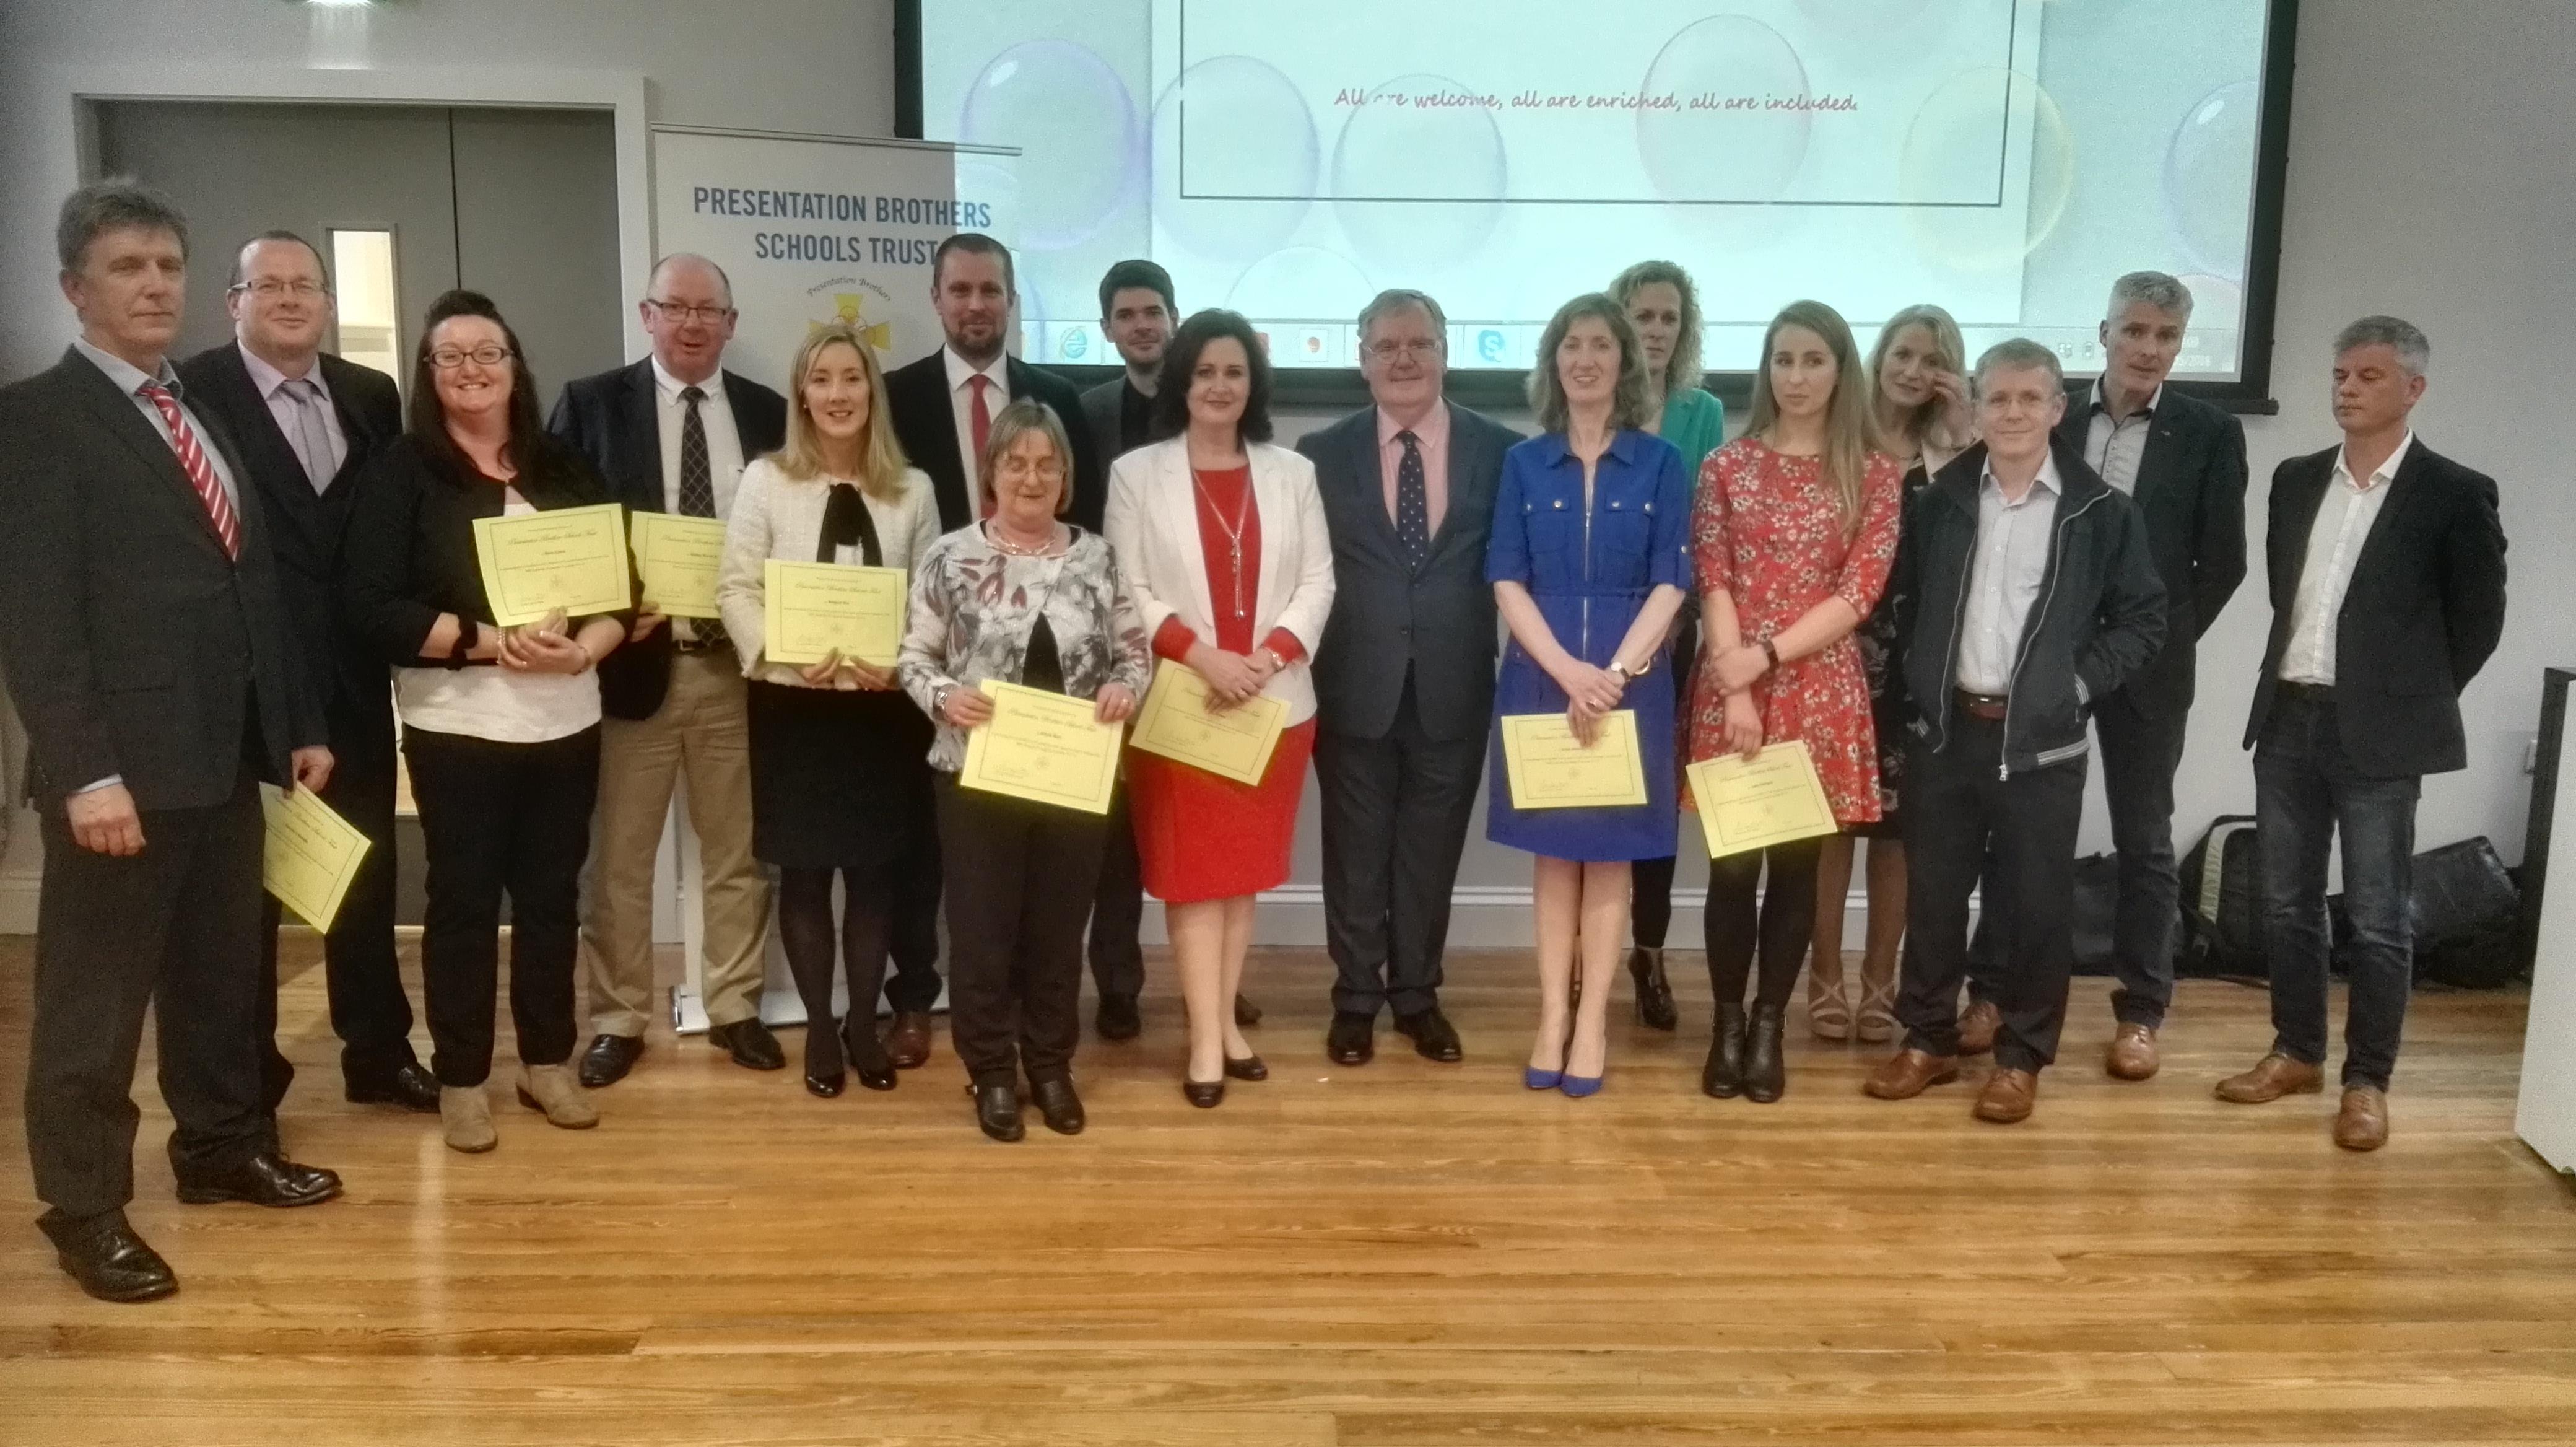 2017-18 PBST Leadership Development Programme Graduation Ceremony